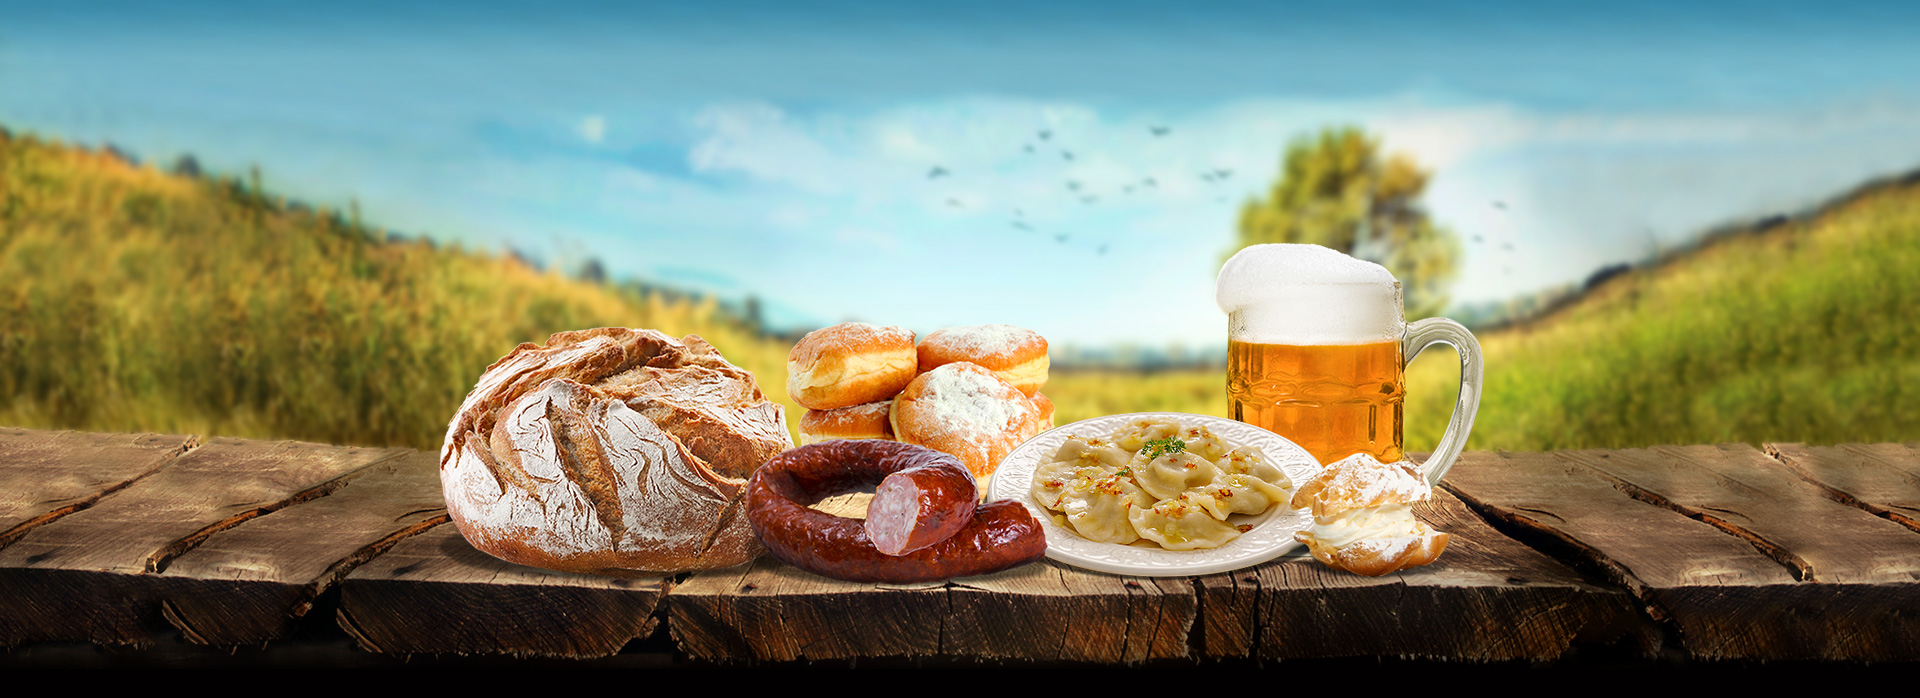 Srodek's Campau Quality Sausage, Co.